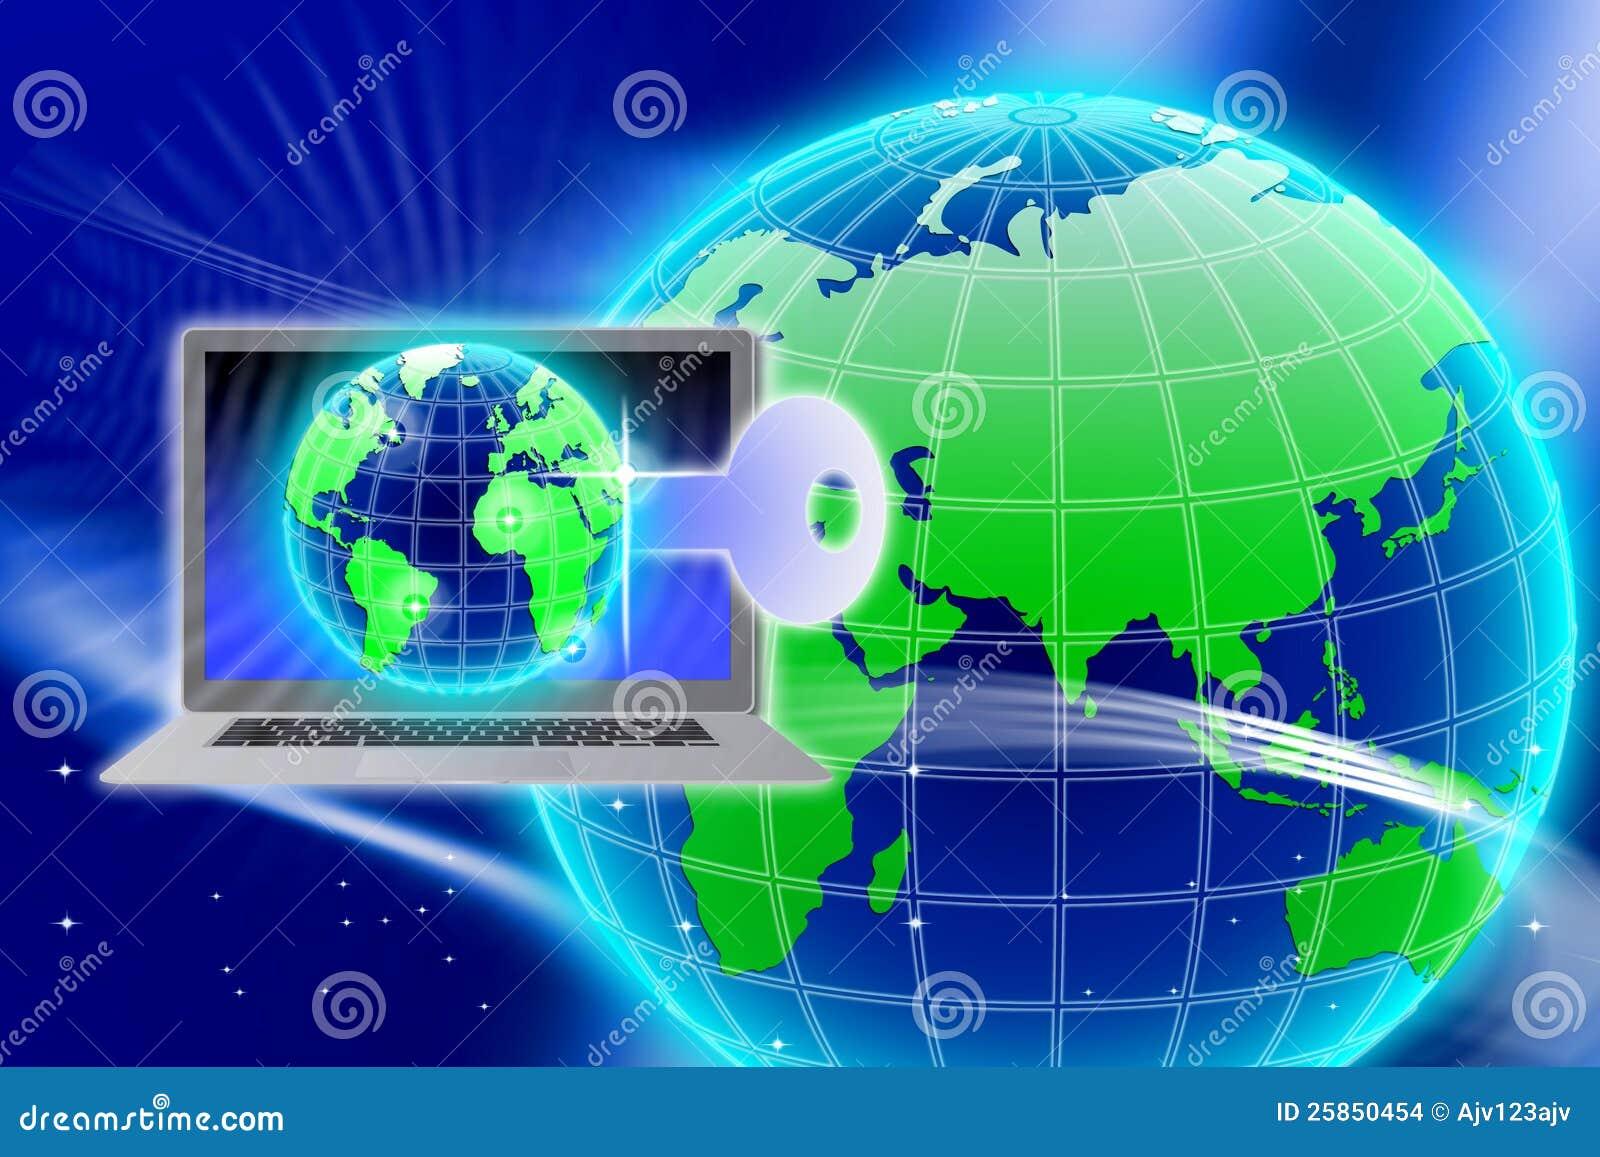 information technology global - photo #40